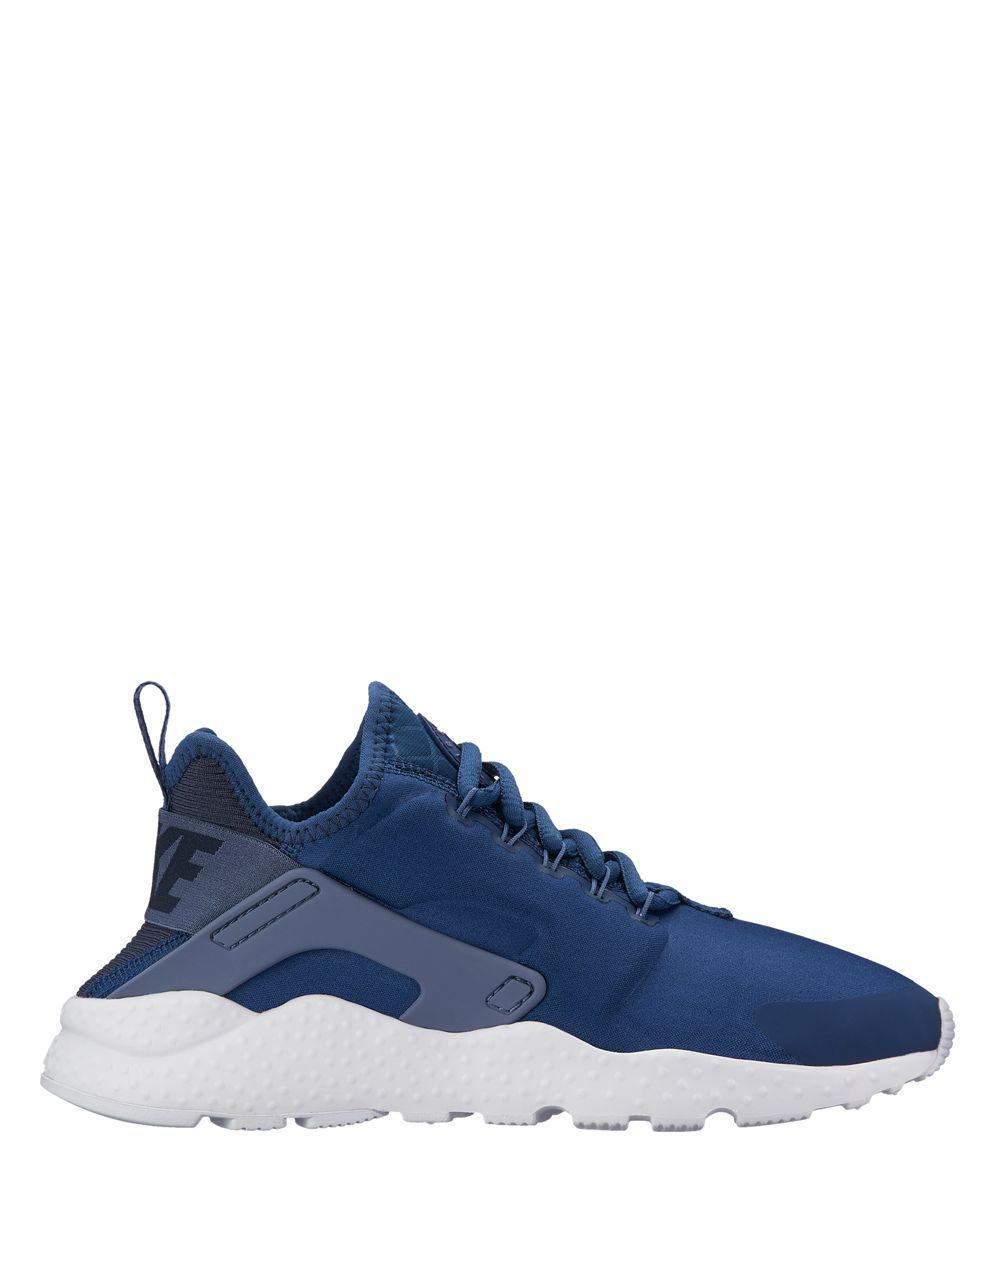 b92214bed6da Lyst - Nike Air Huarache Run Ultra Low Top Sneakers in Blue for Men